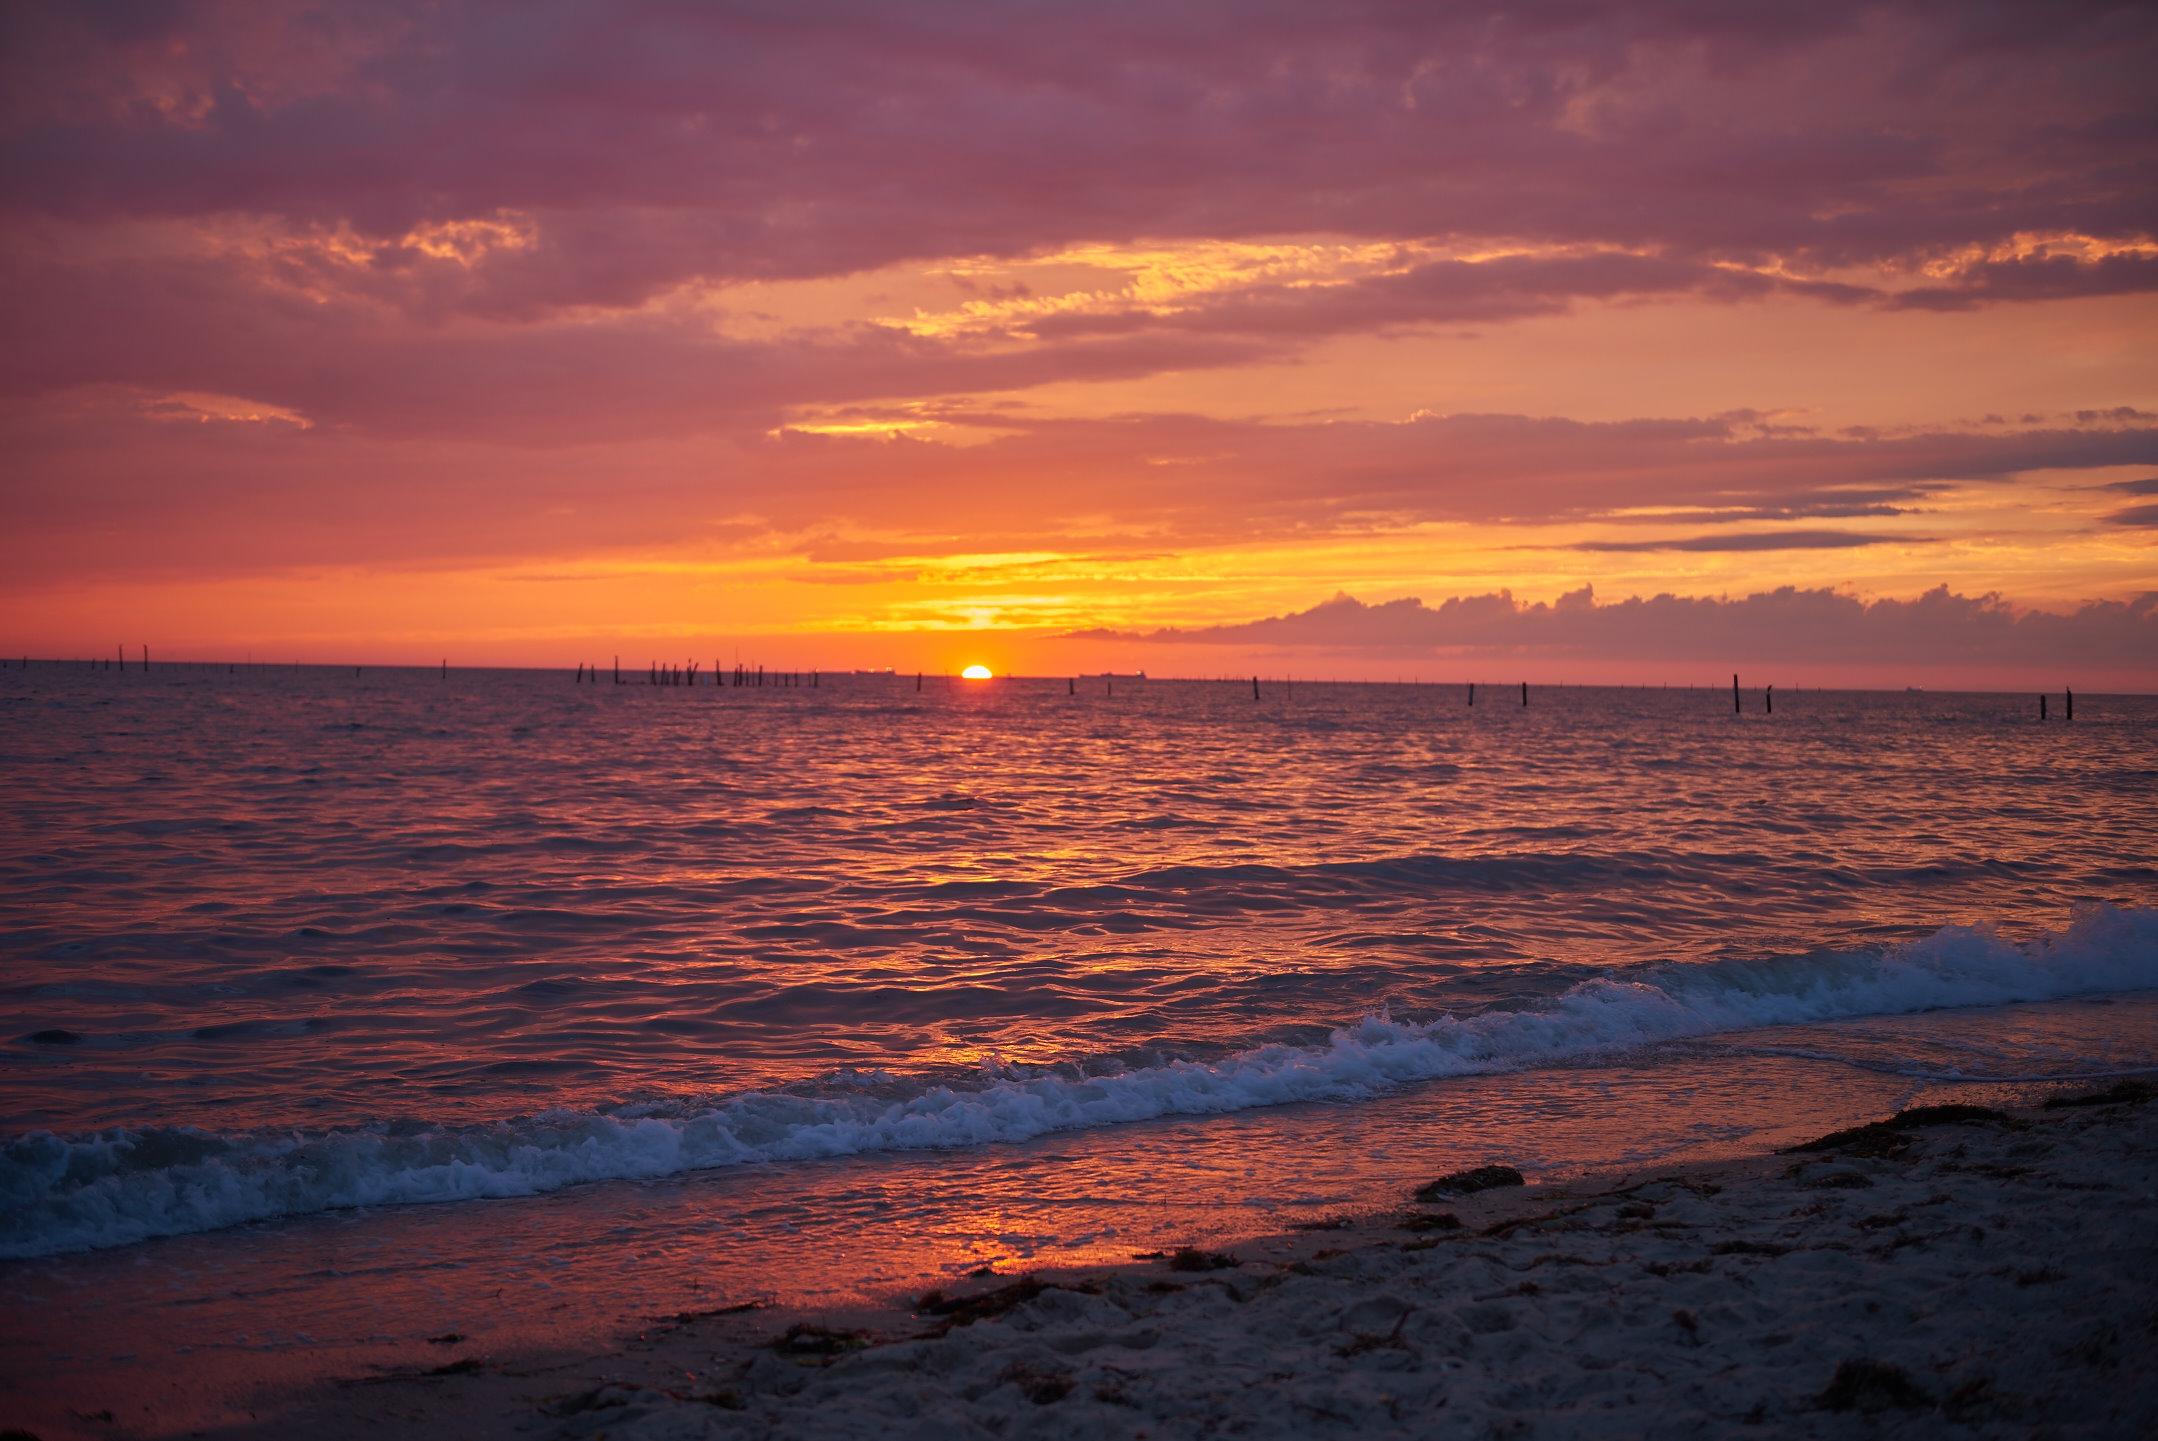 sunset-7-8-2017-04--122